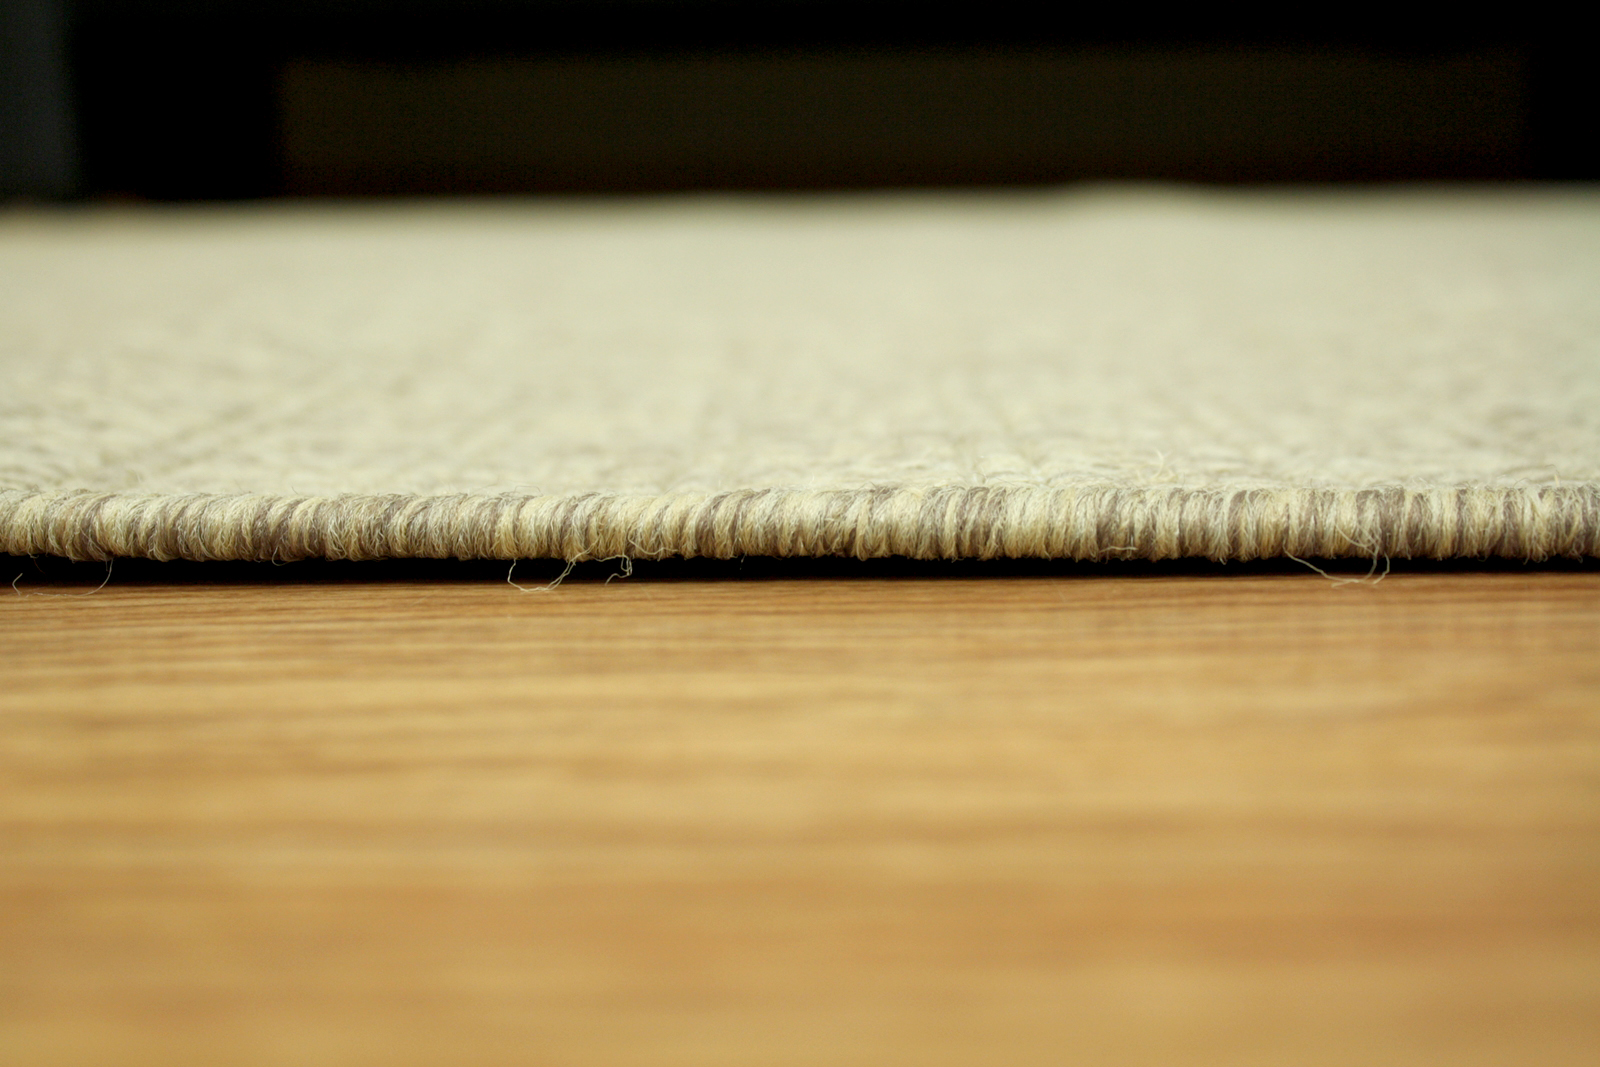 Teppich Agnella Diuna Ardea dunkles Beige flach gewebt s1